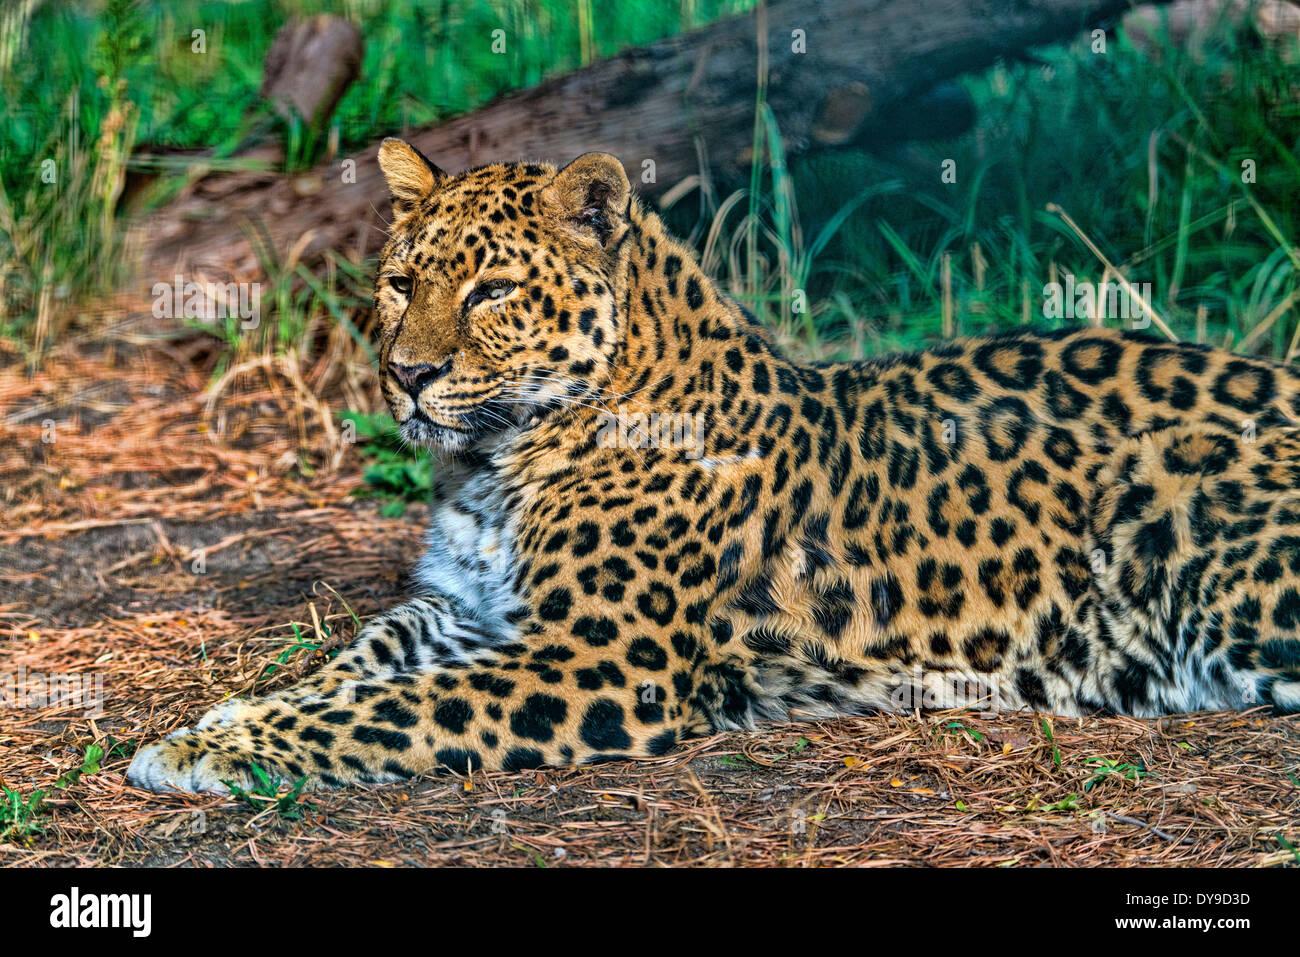 Amur Leopard, panthera pardus orientalis, leopard, animal, portrait, USA, United States, America, - Stock Image